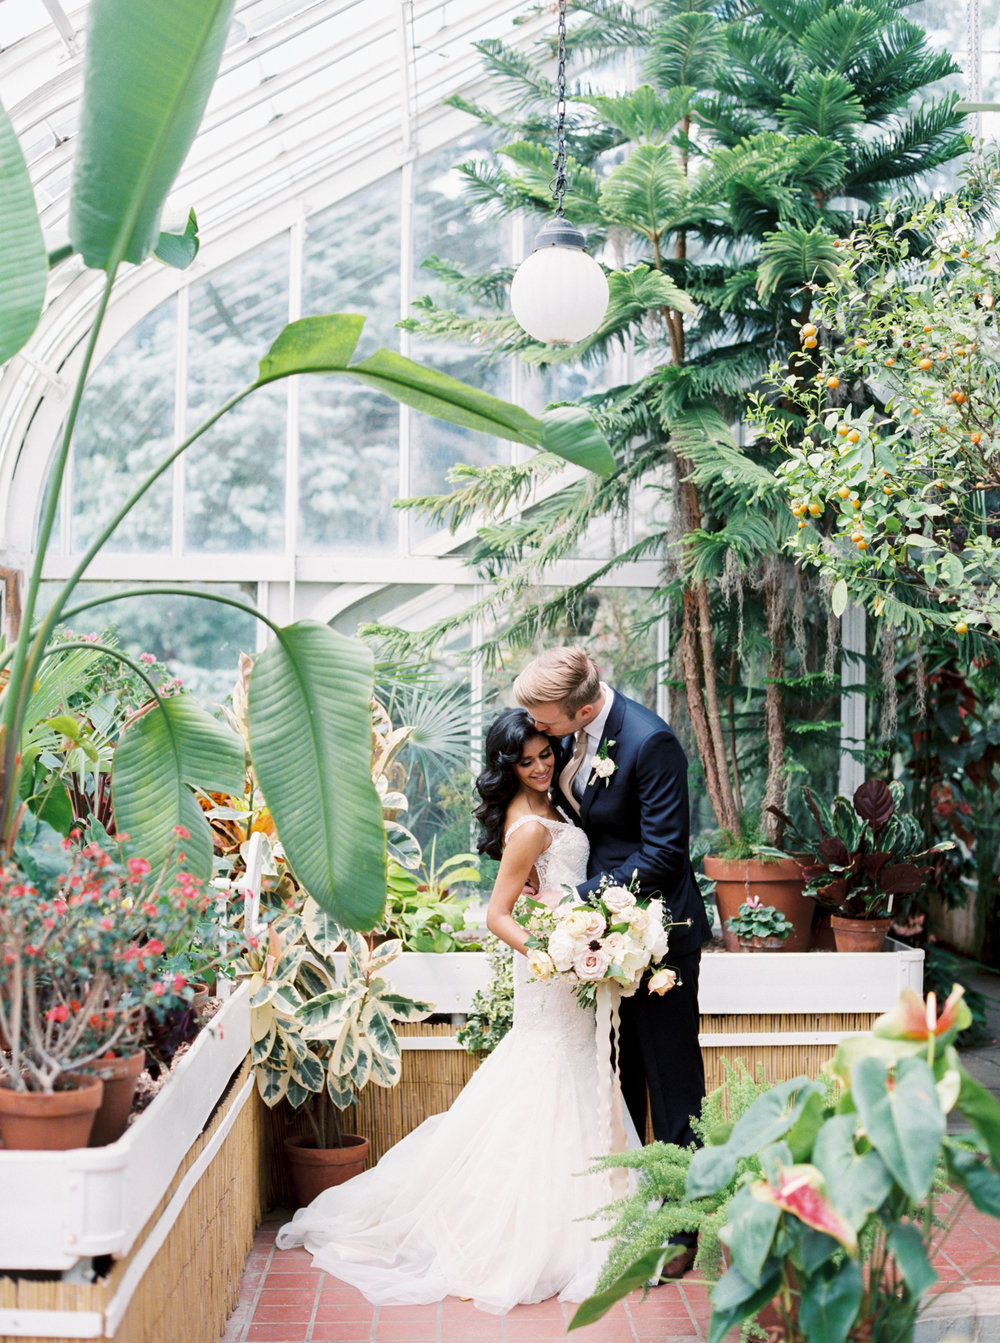 Green House Wedding - Tulsa Garden Center Wedding - eversomething.com